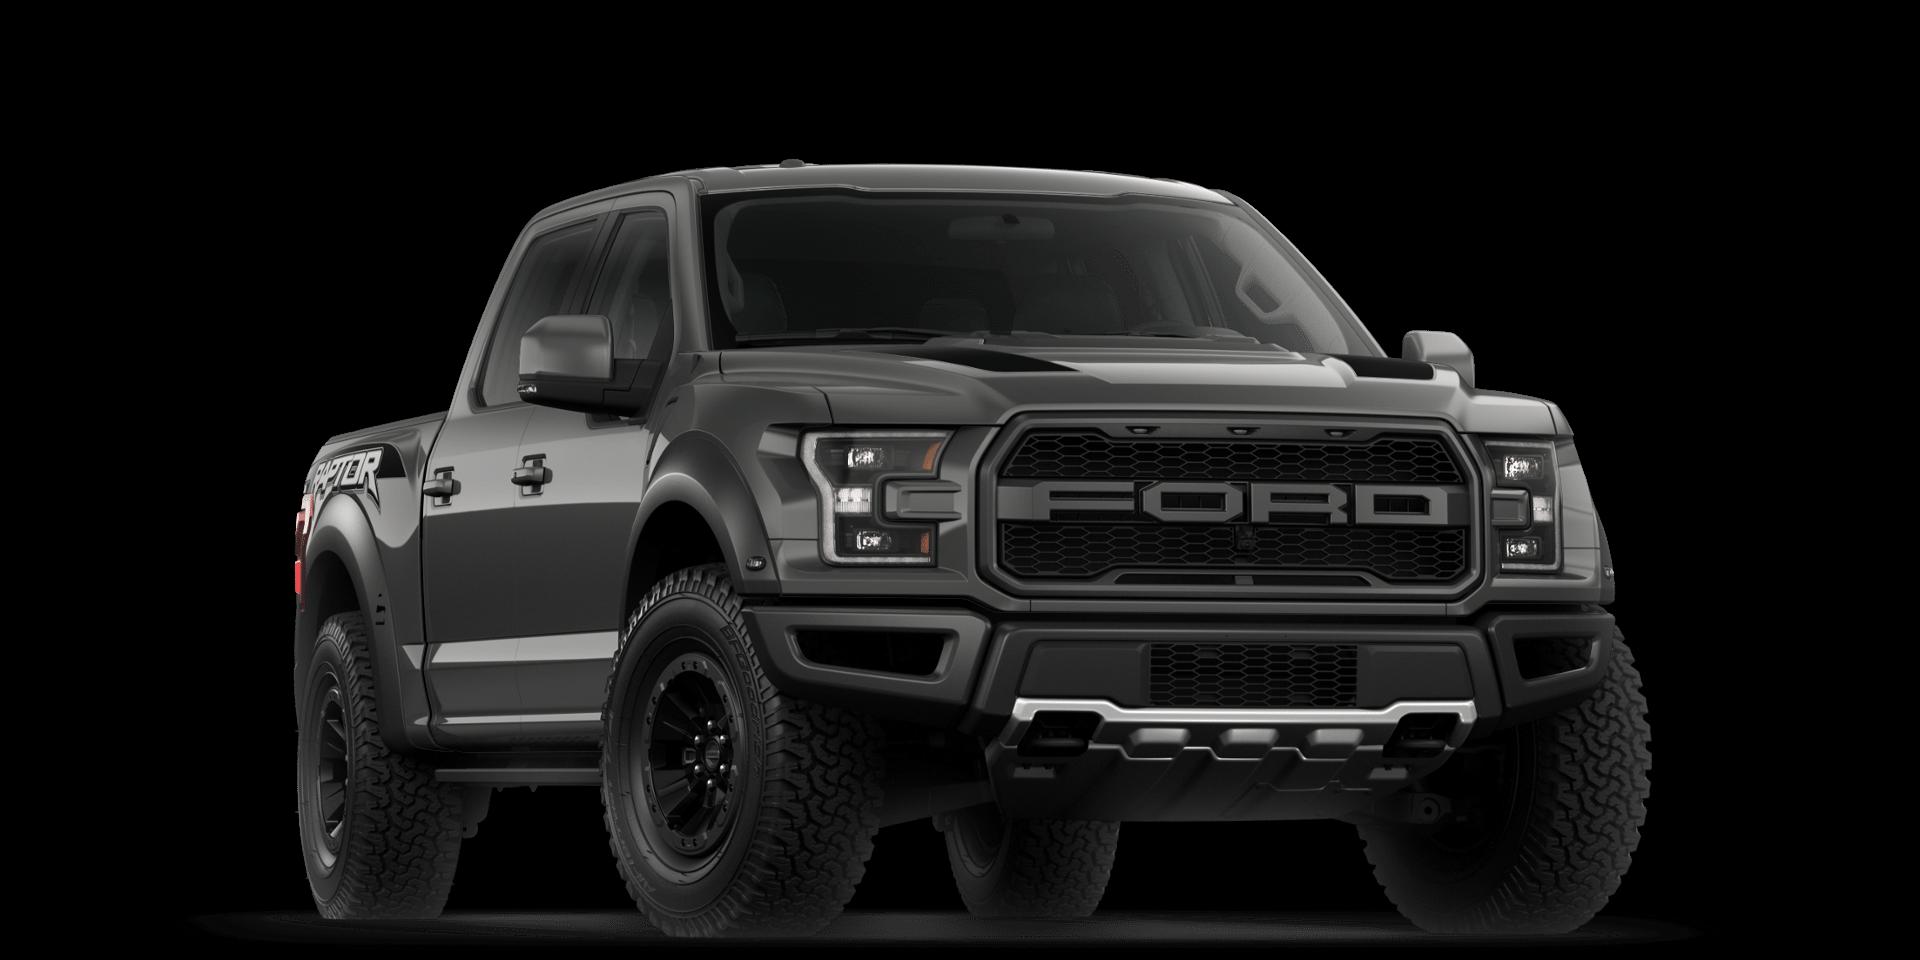 2017 Ford F 150 Build Amp Price Ford F150 Hybrid Car Ford